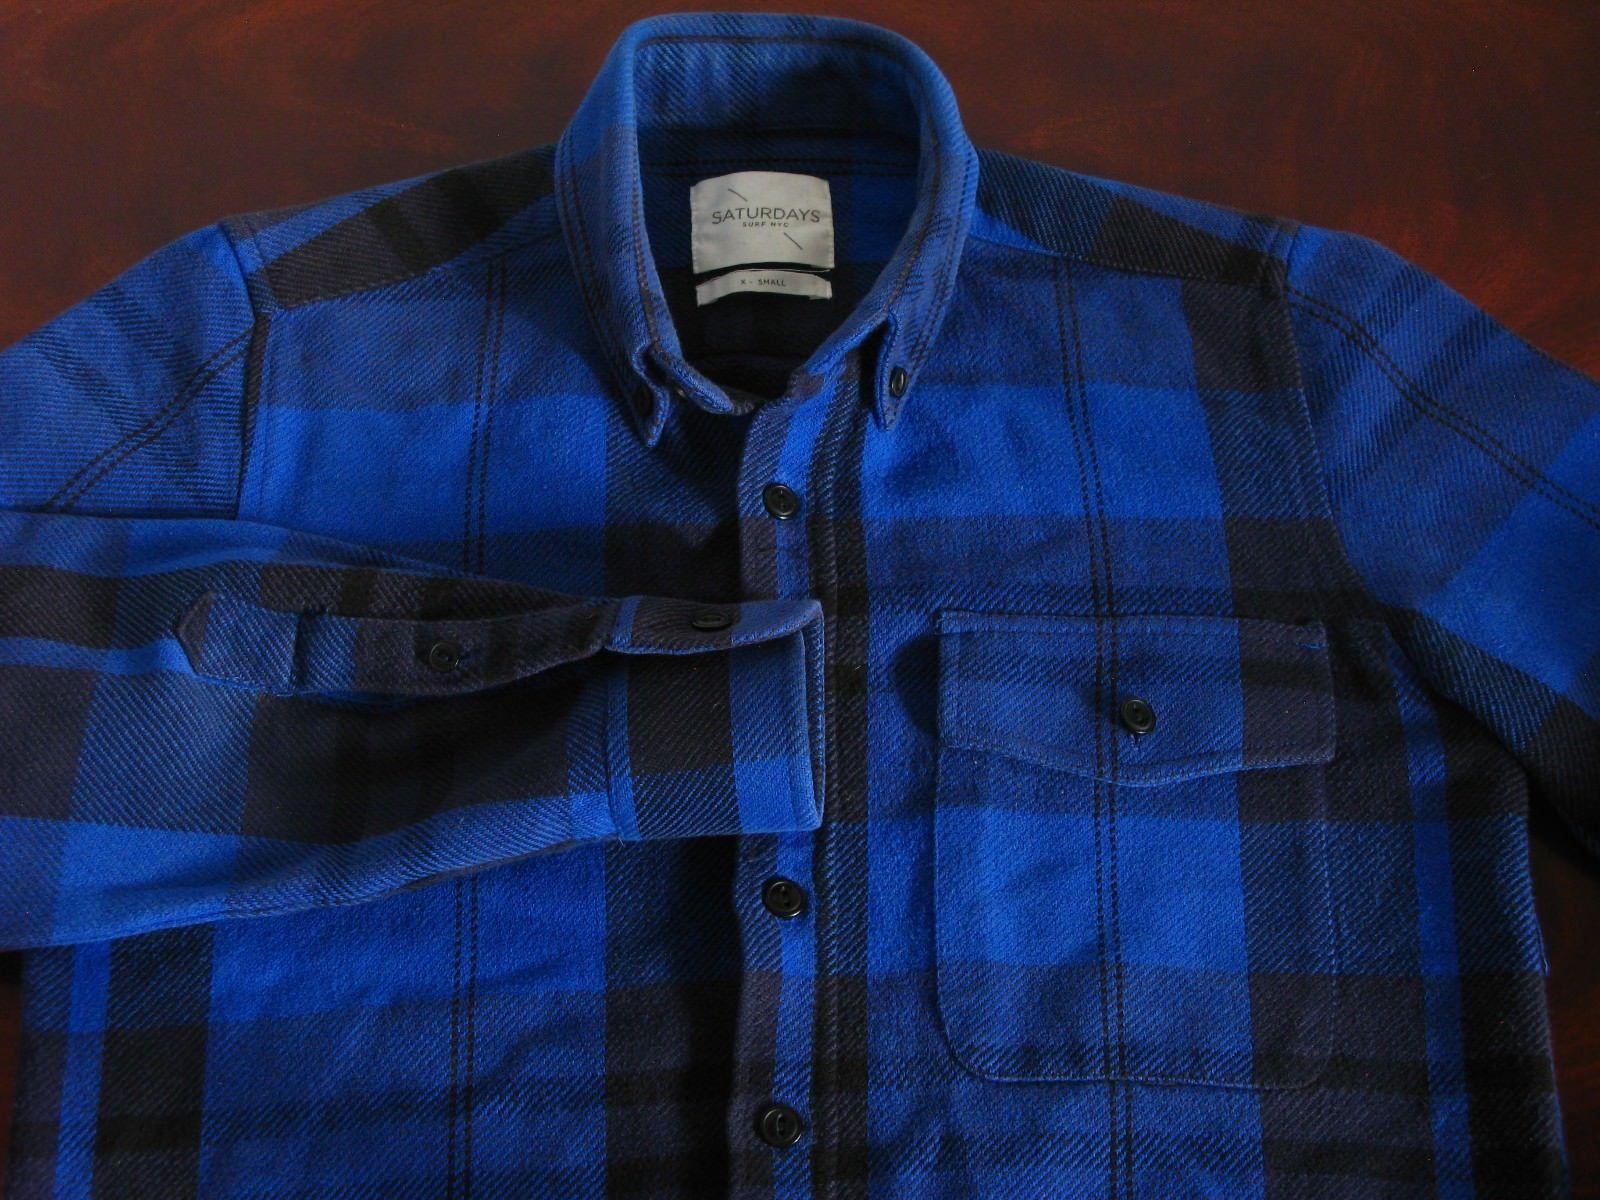 Flannel shirt xs  Mens SATURDAYS SURF NYC BlueBlack  Cotton Flannel Shirt XS